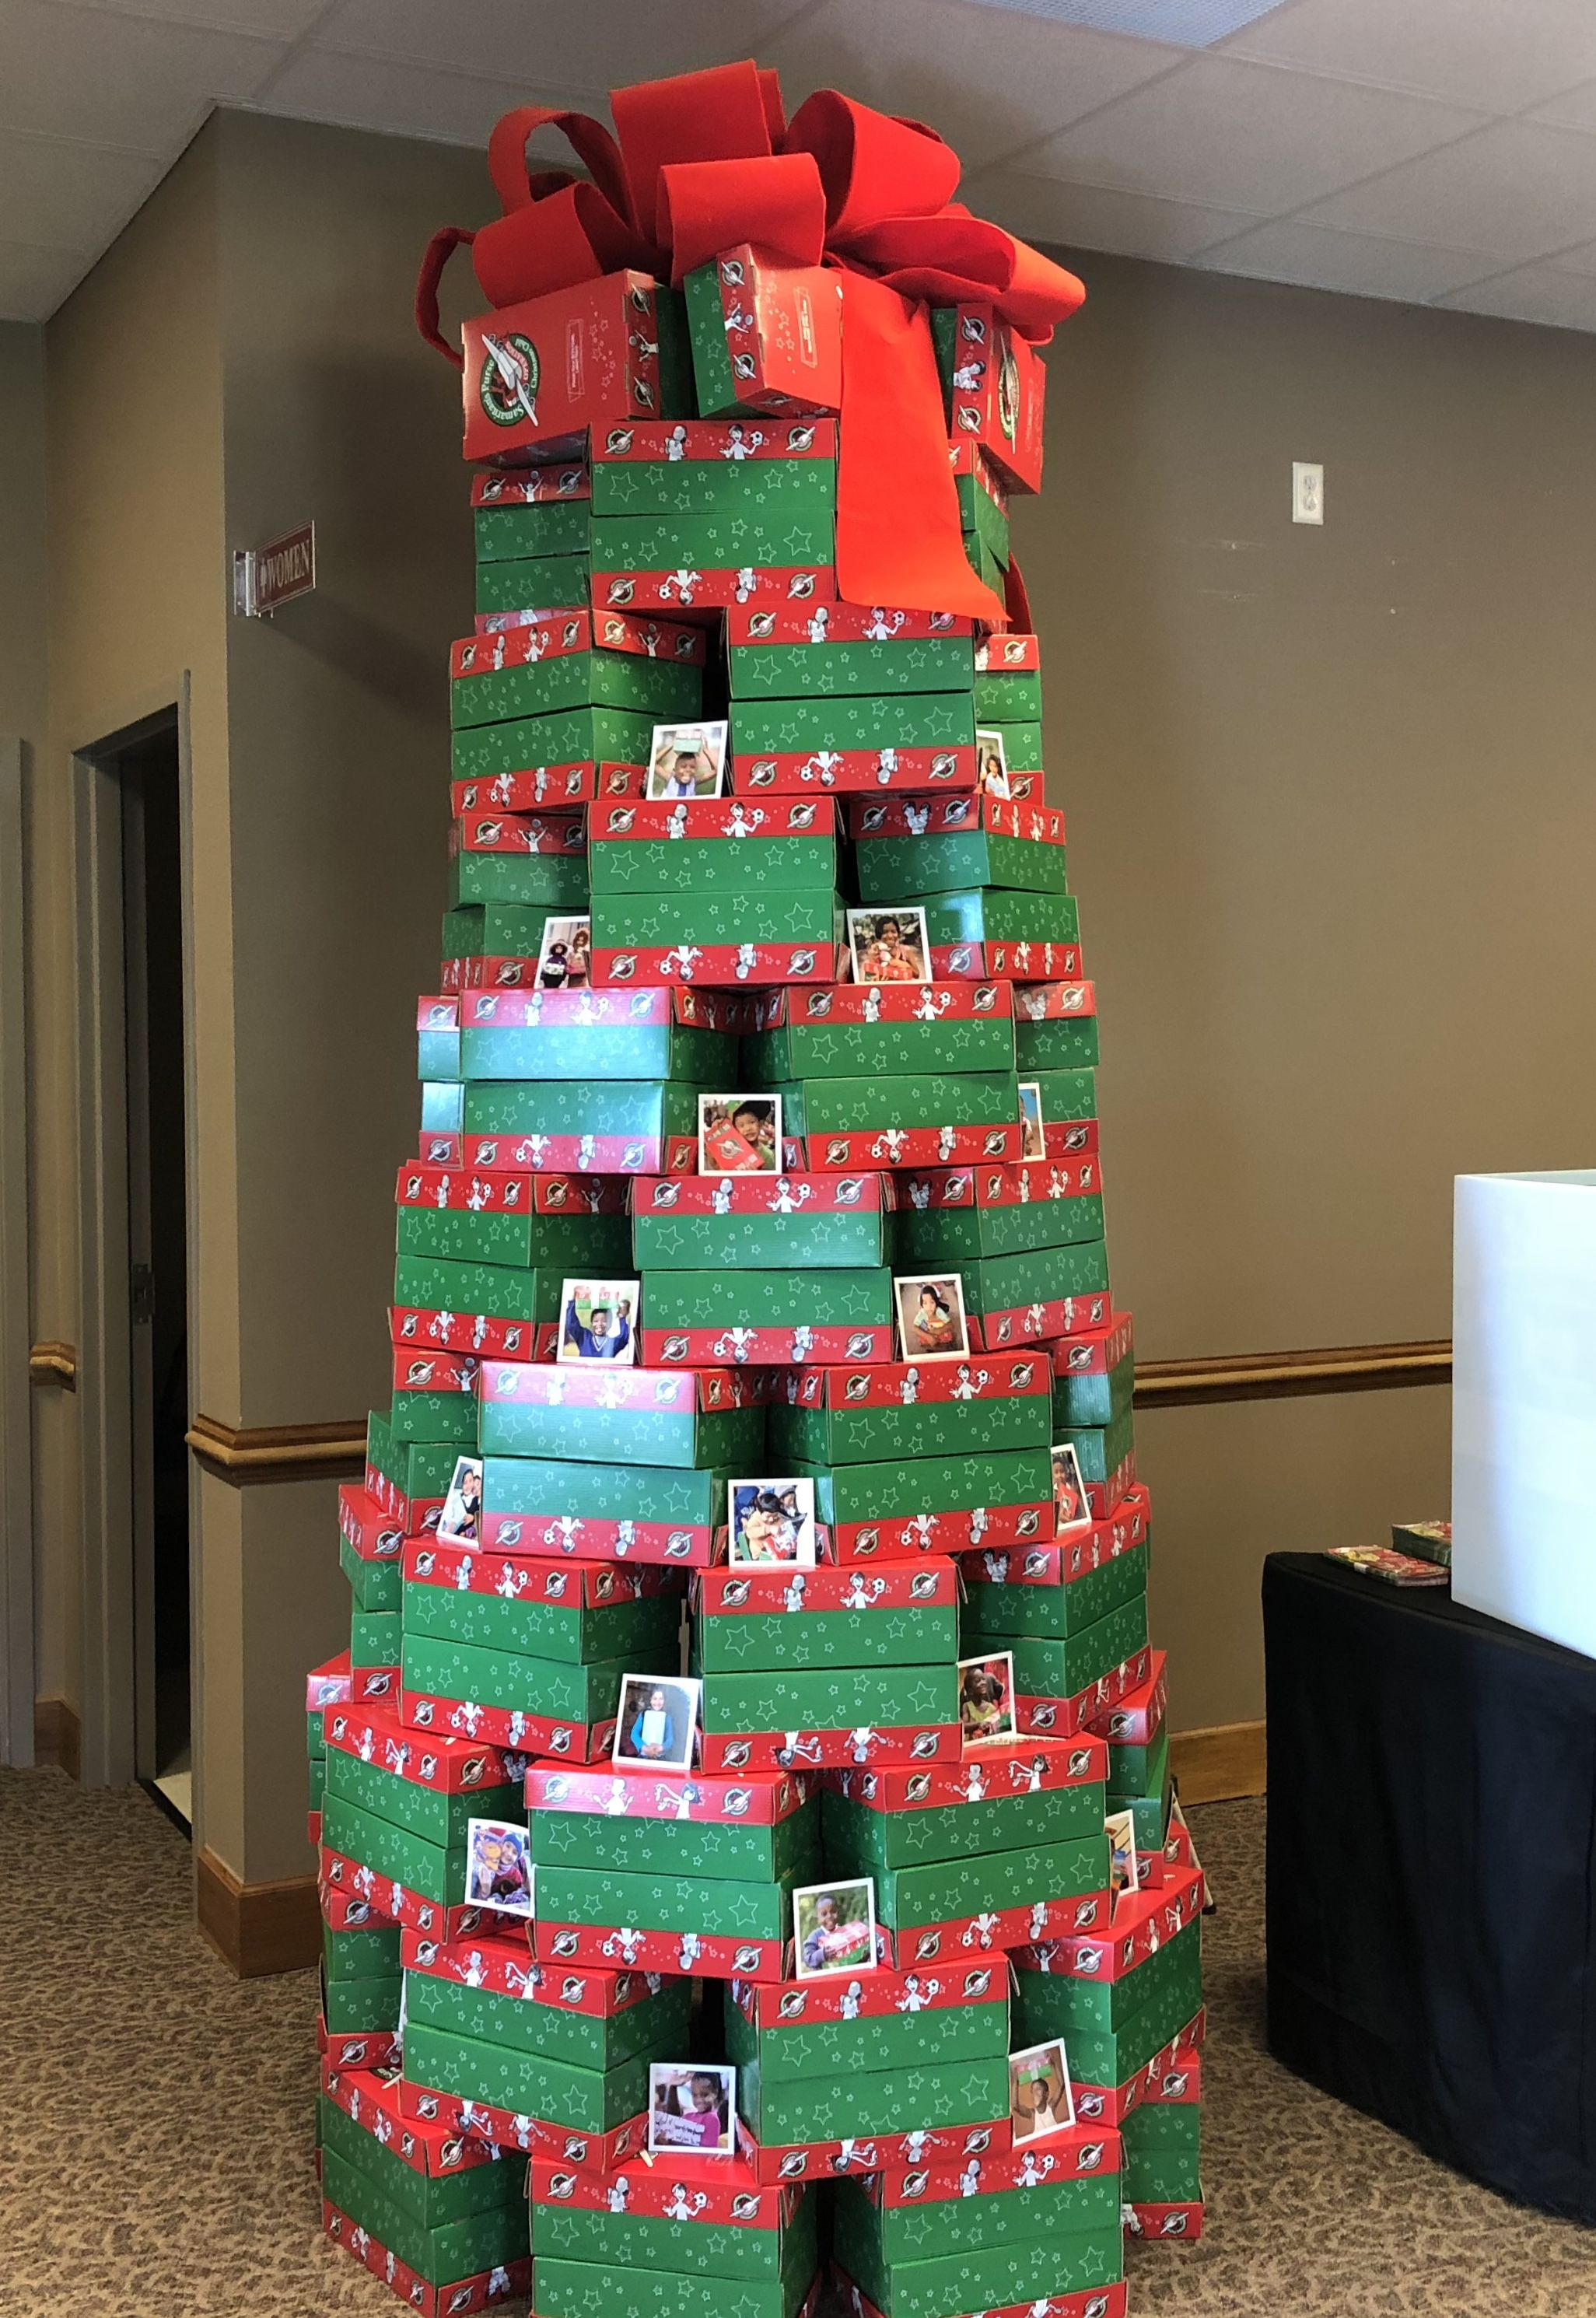 Operation Christmas Child Shoebox Display.Operation Christmas Child Operation Christmas Child Boxes